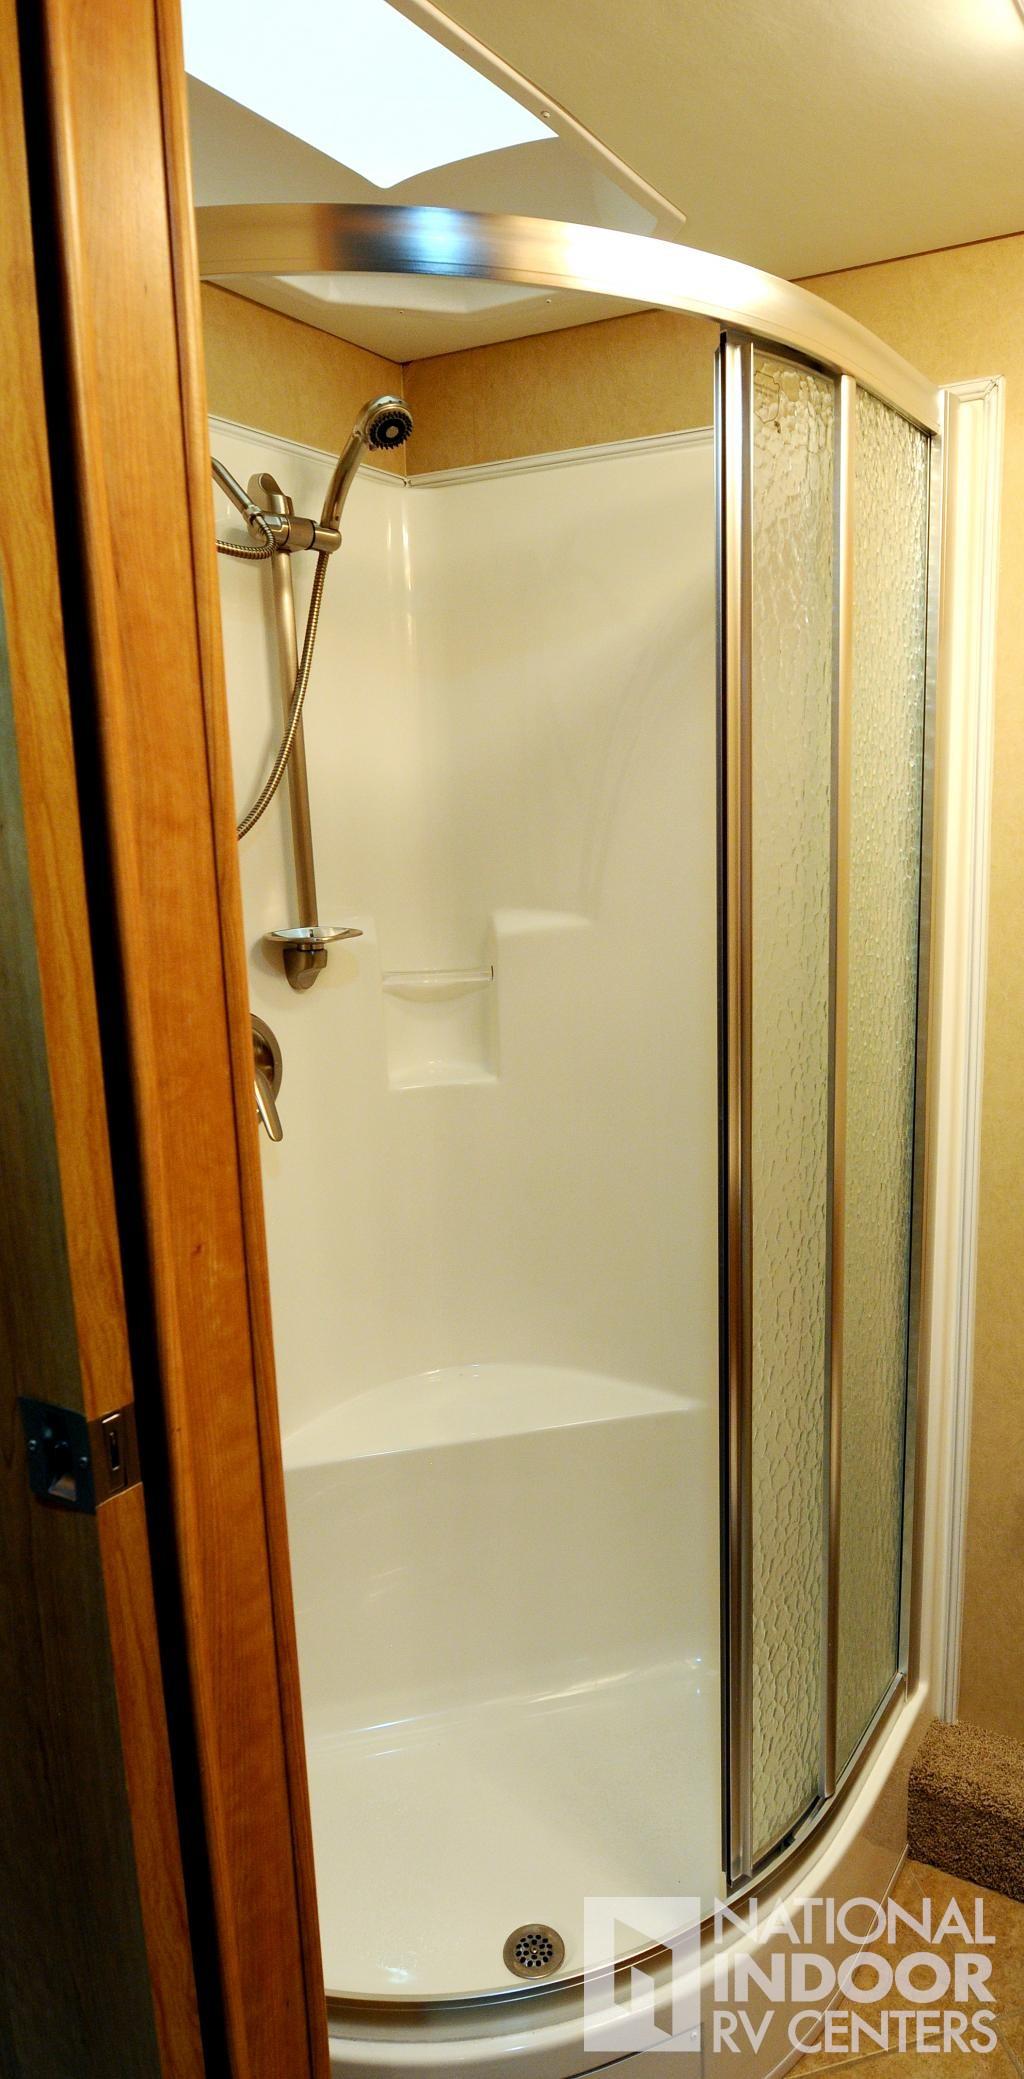 automotive safety glass door com doors rv latch industries coastal amazon shower dp